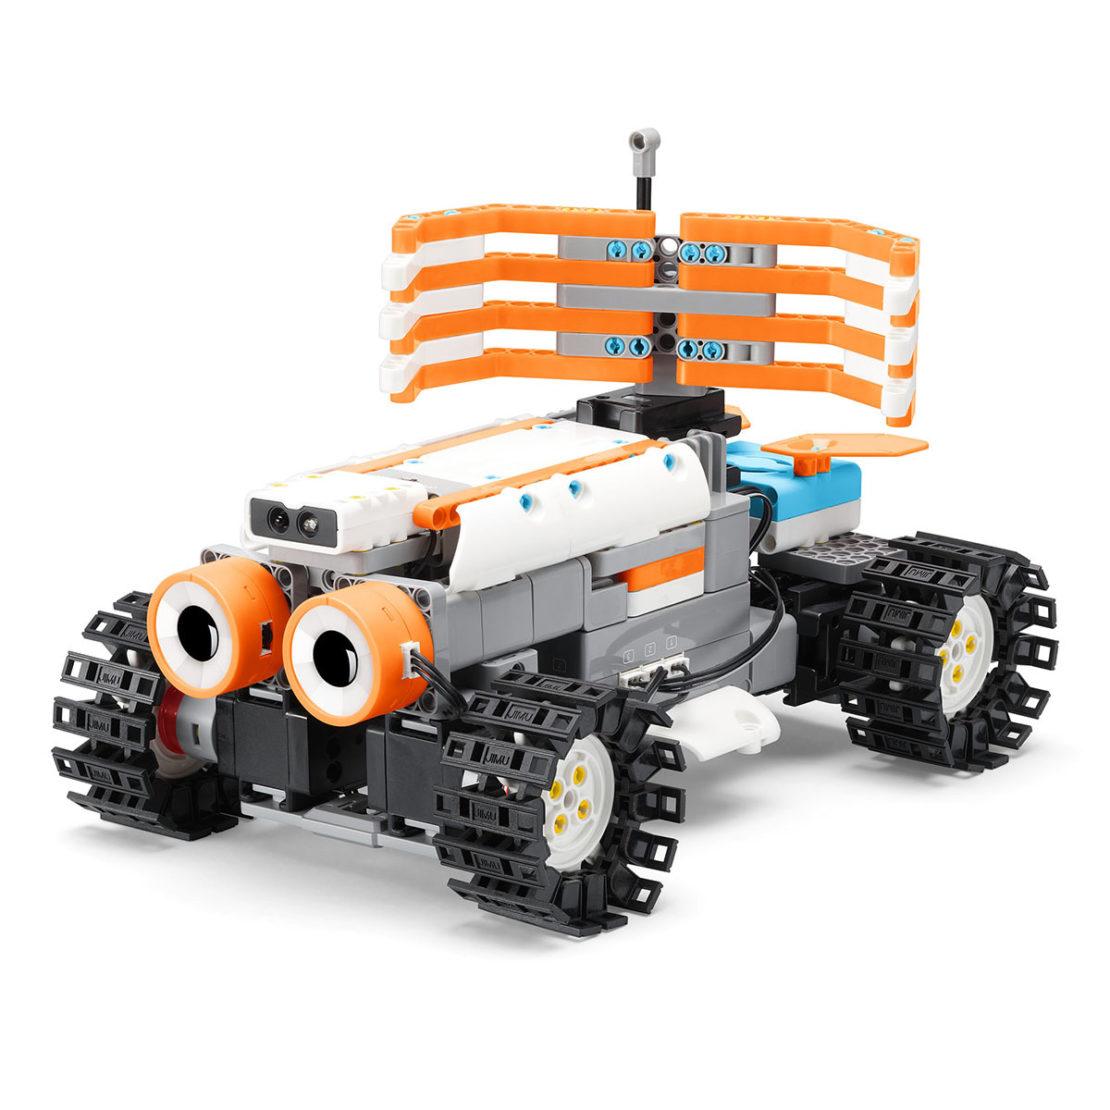 Jimu Astrobot Rover